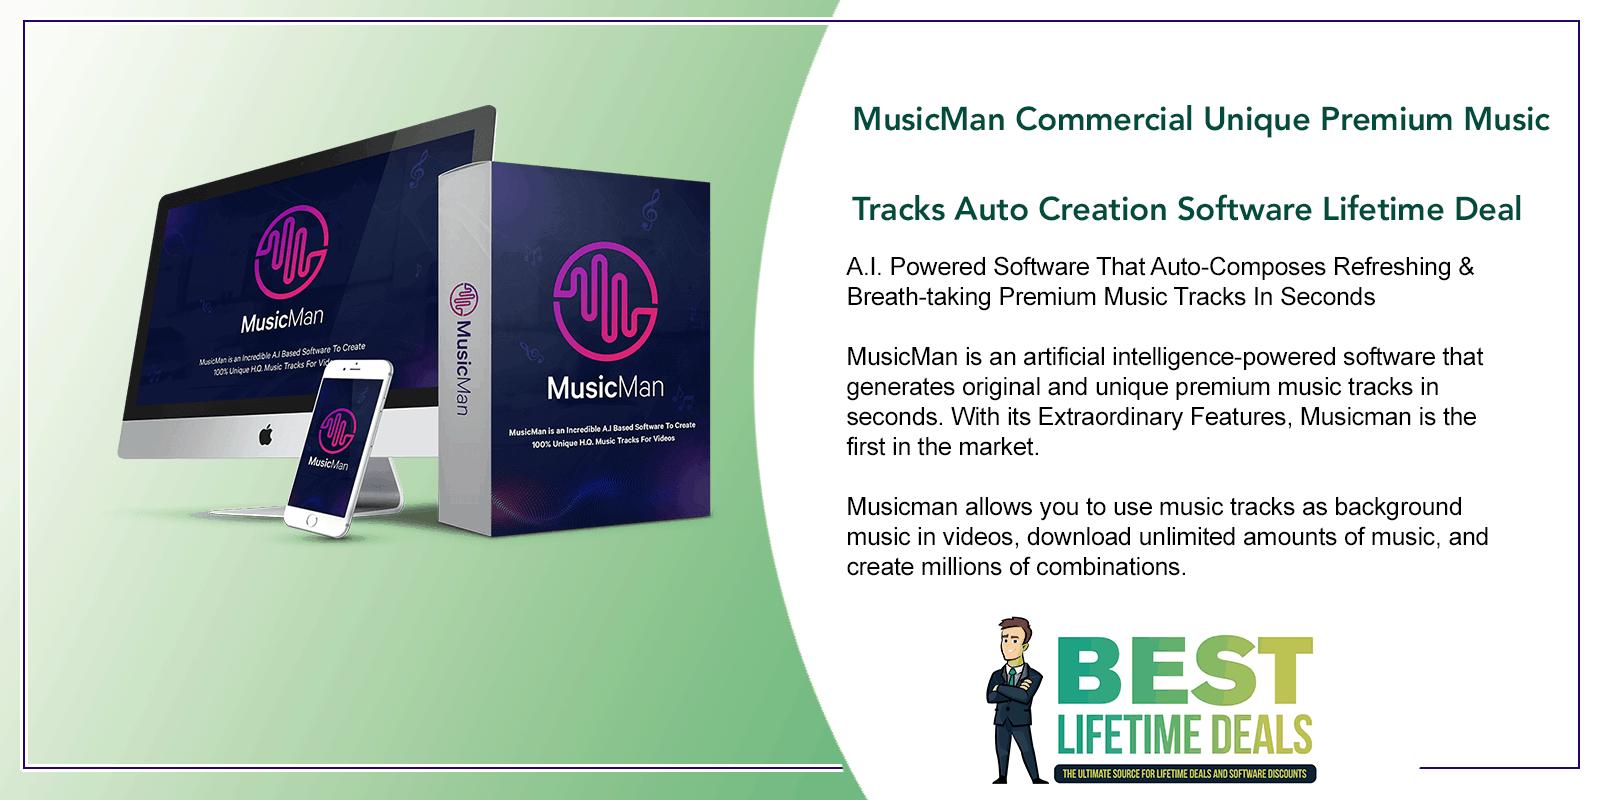 MusicMan Commercial Unique Premium Music Tracks Auto Creation Software Featured Image